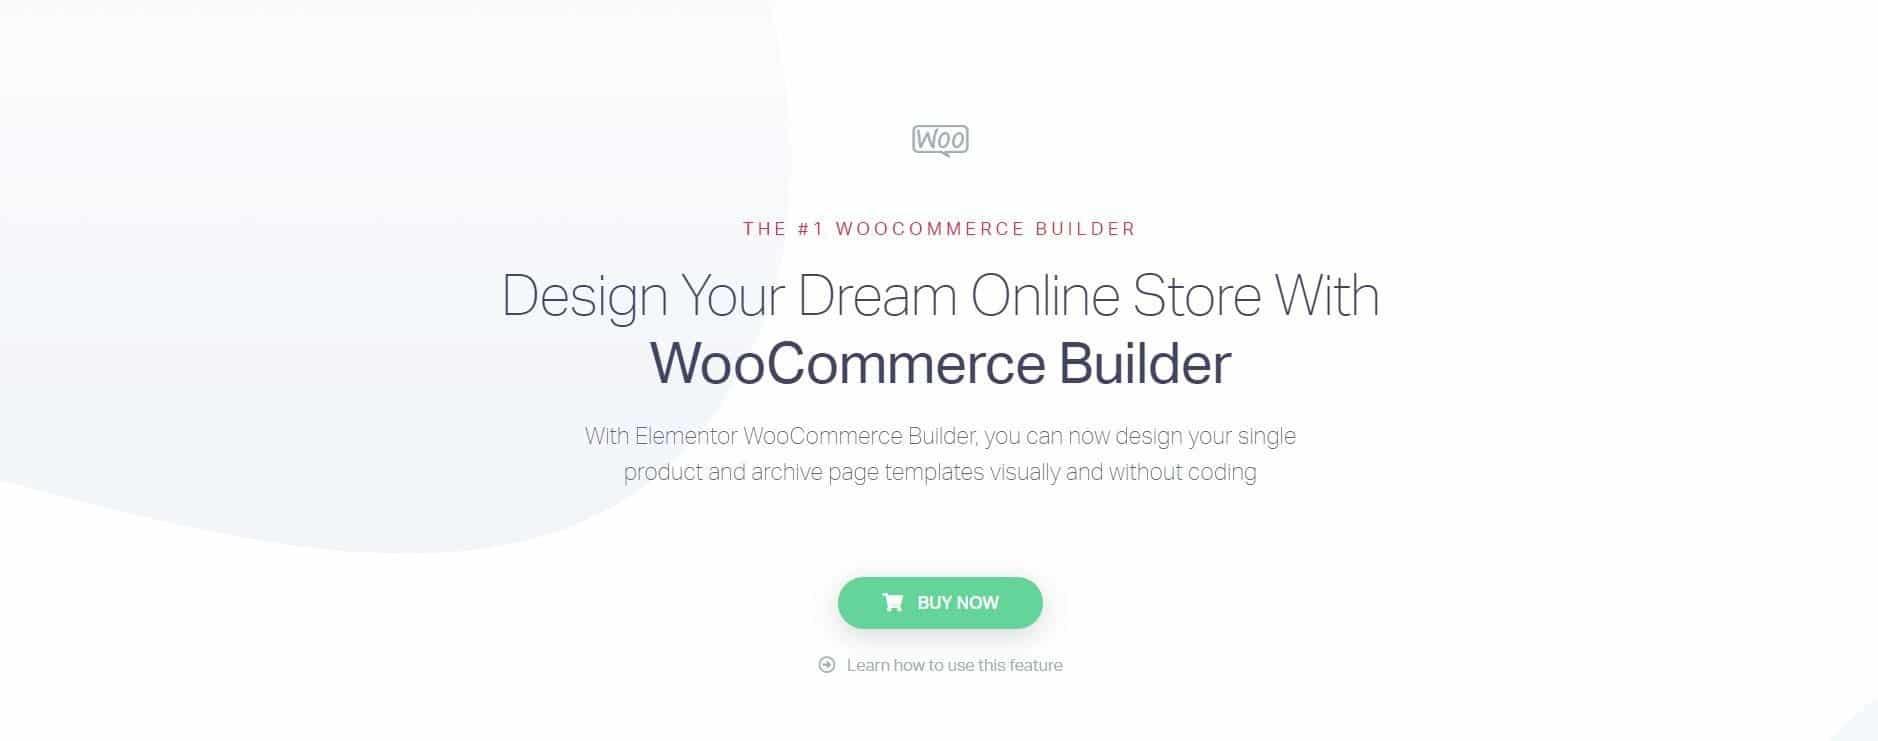 Elementor-pro-woocommerce-builder